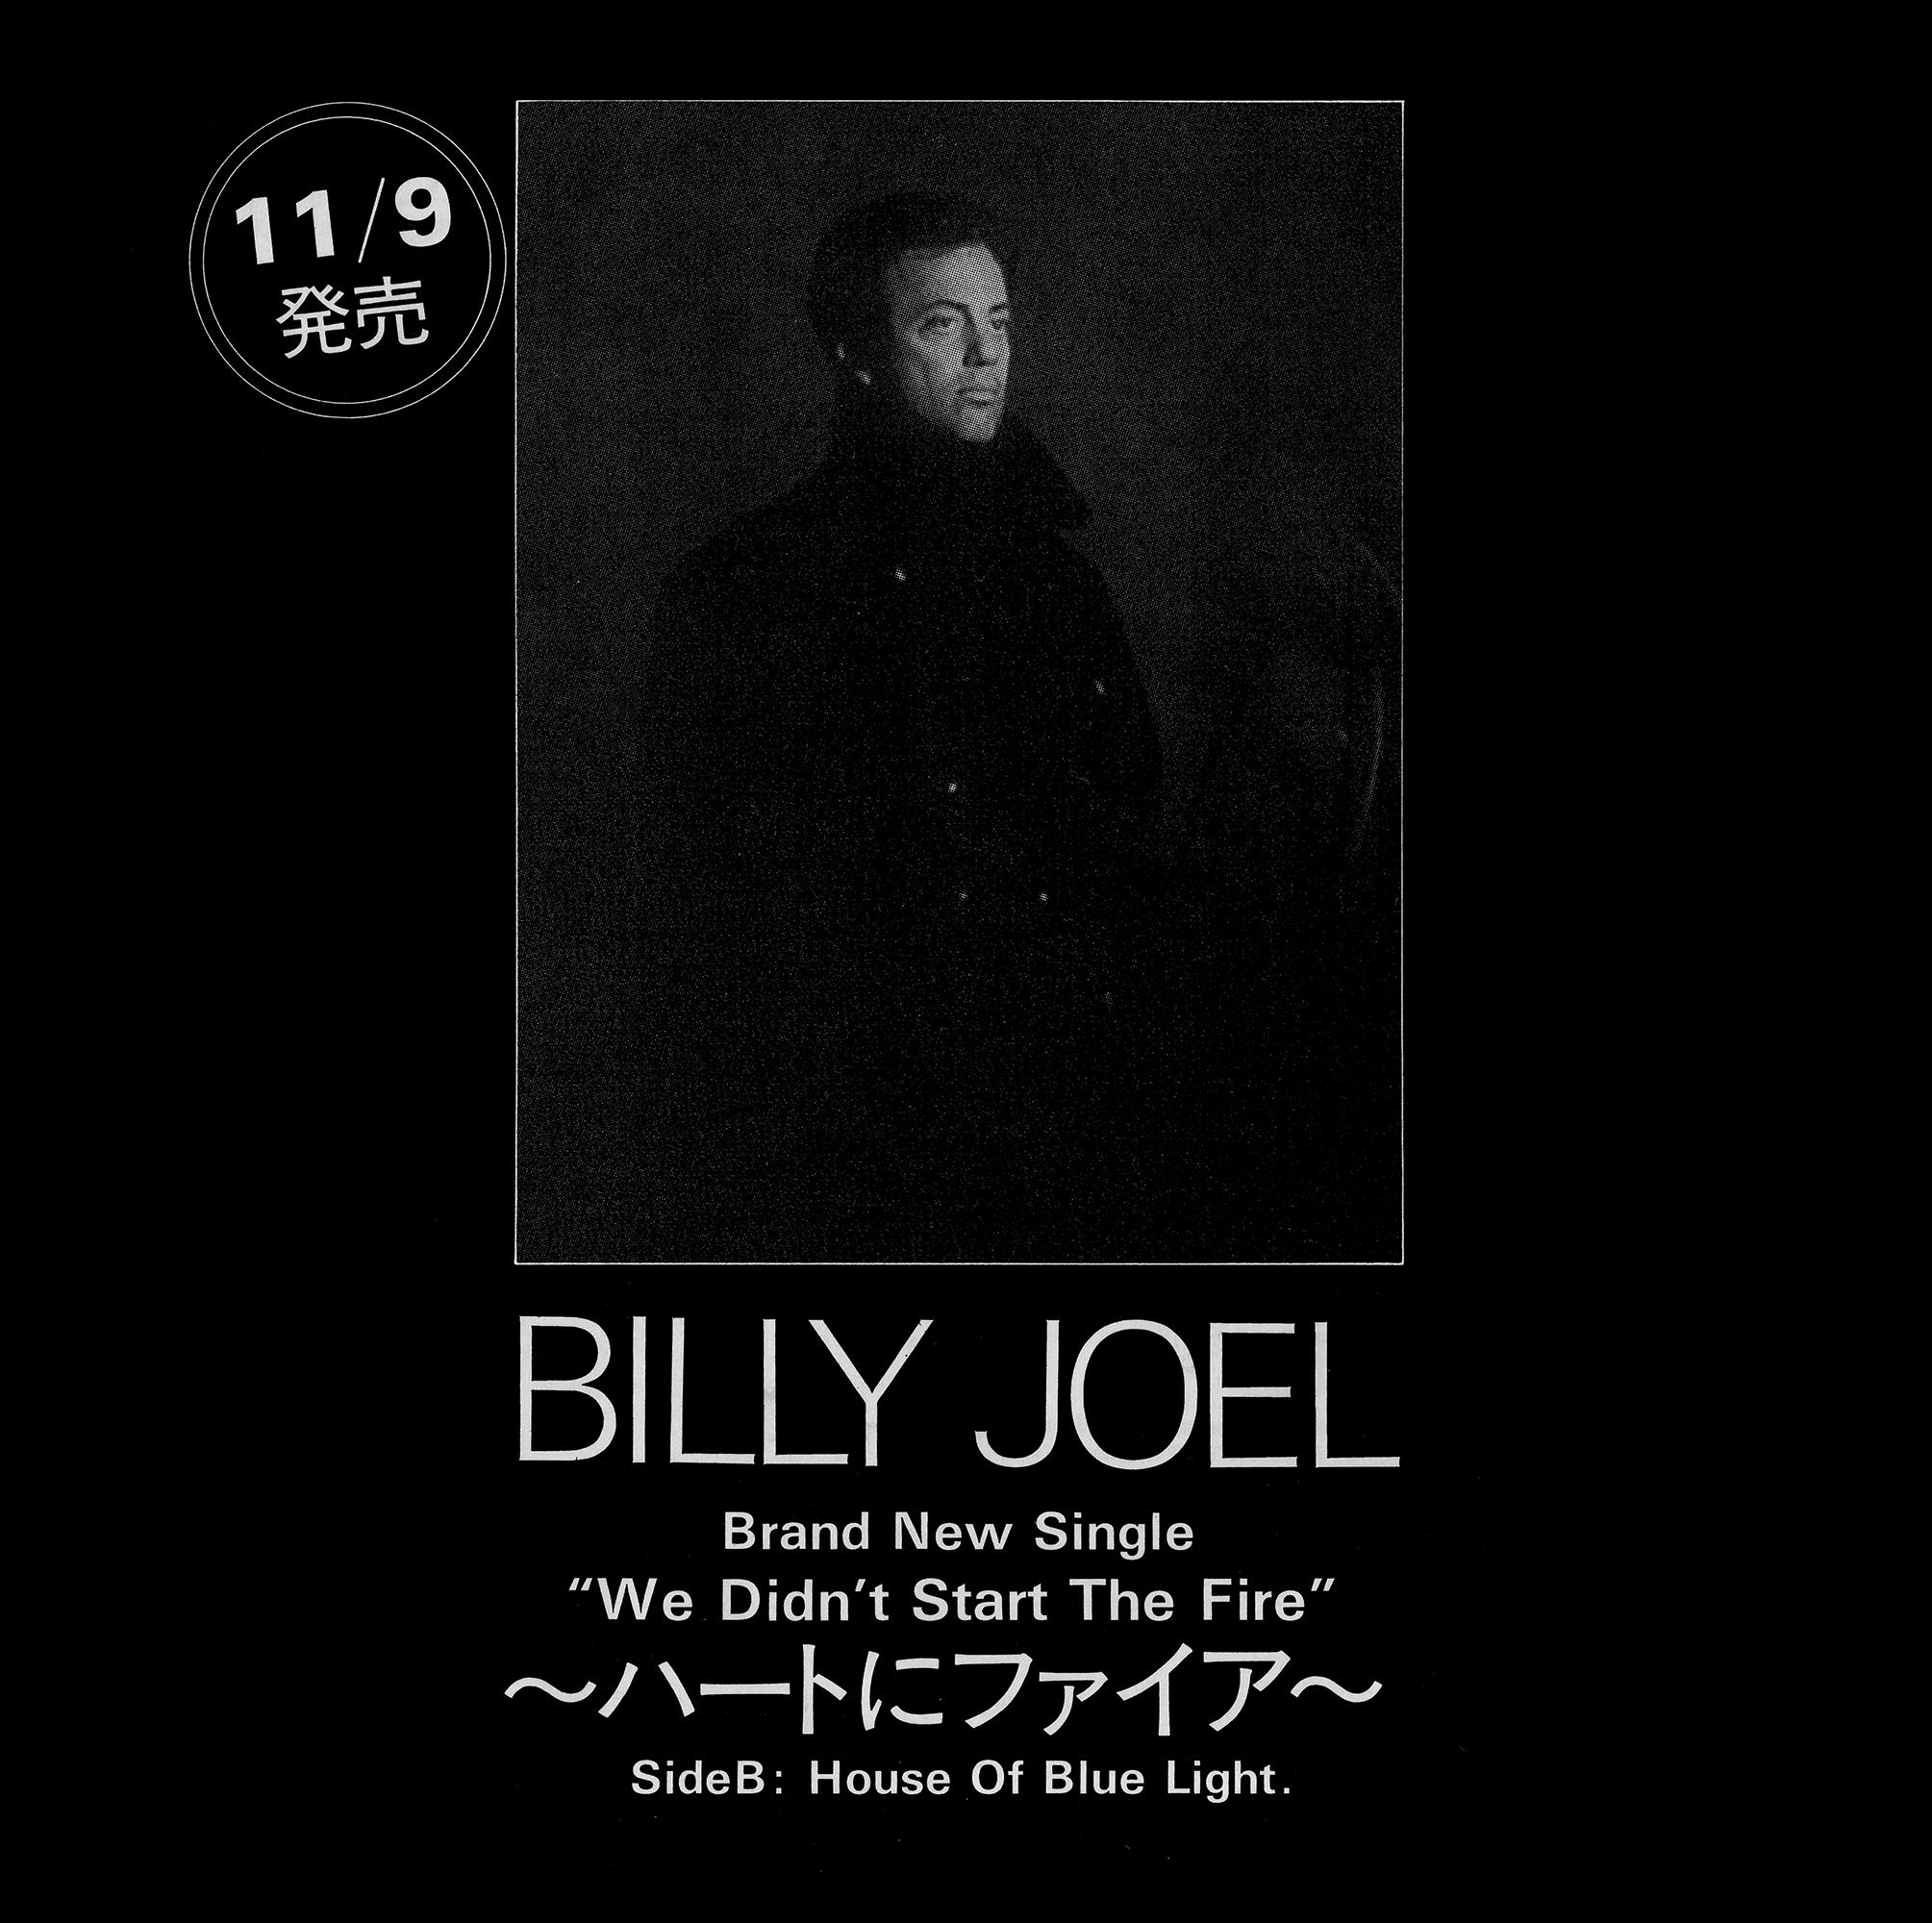 We Didn T Start The Fire Billy Joel: 高画質ジャケット画像.com